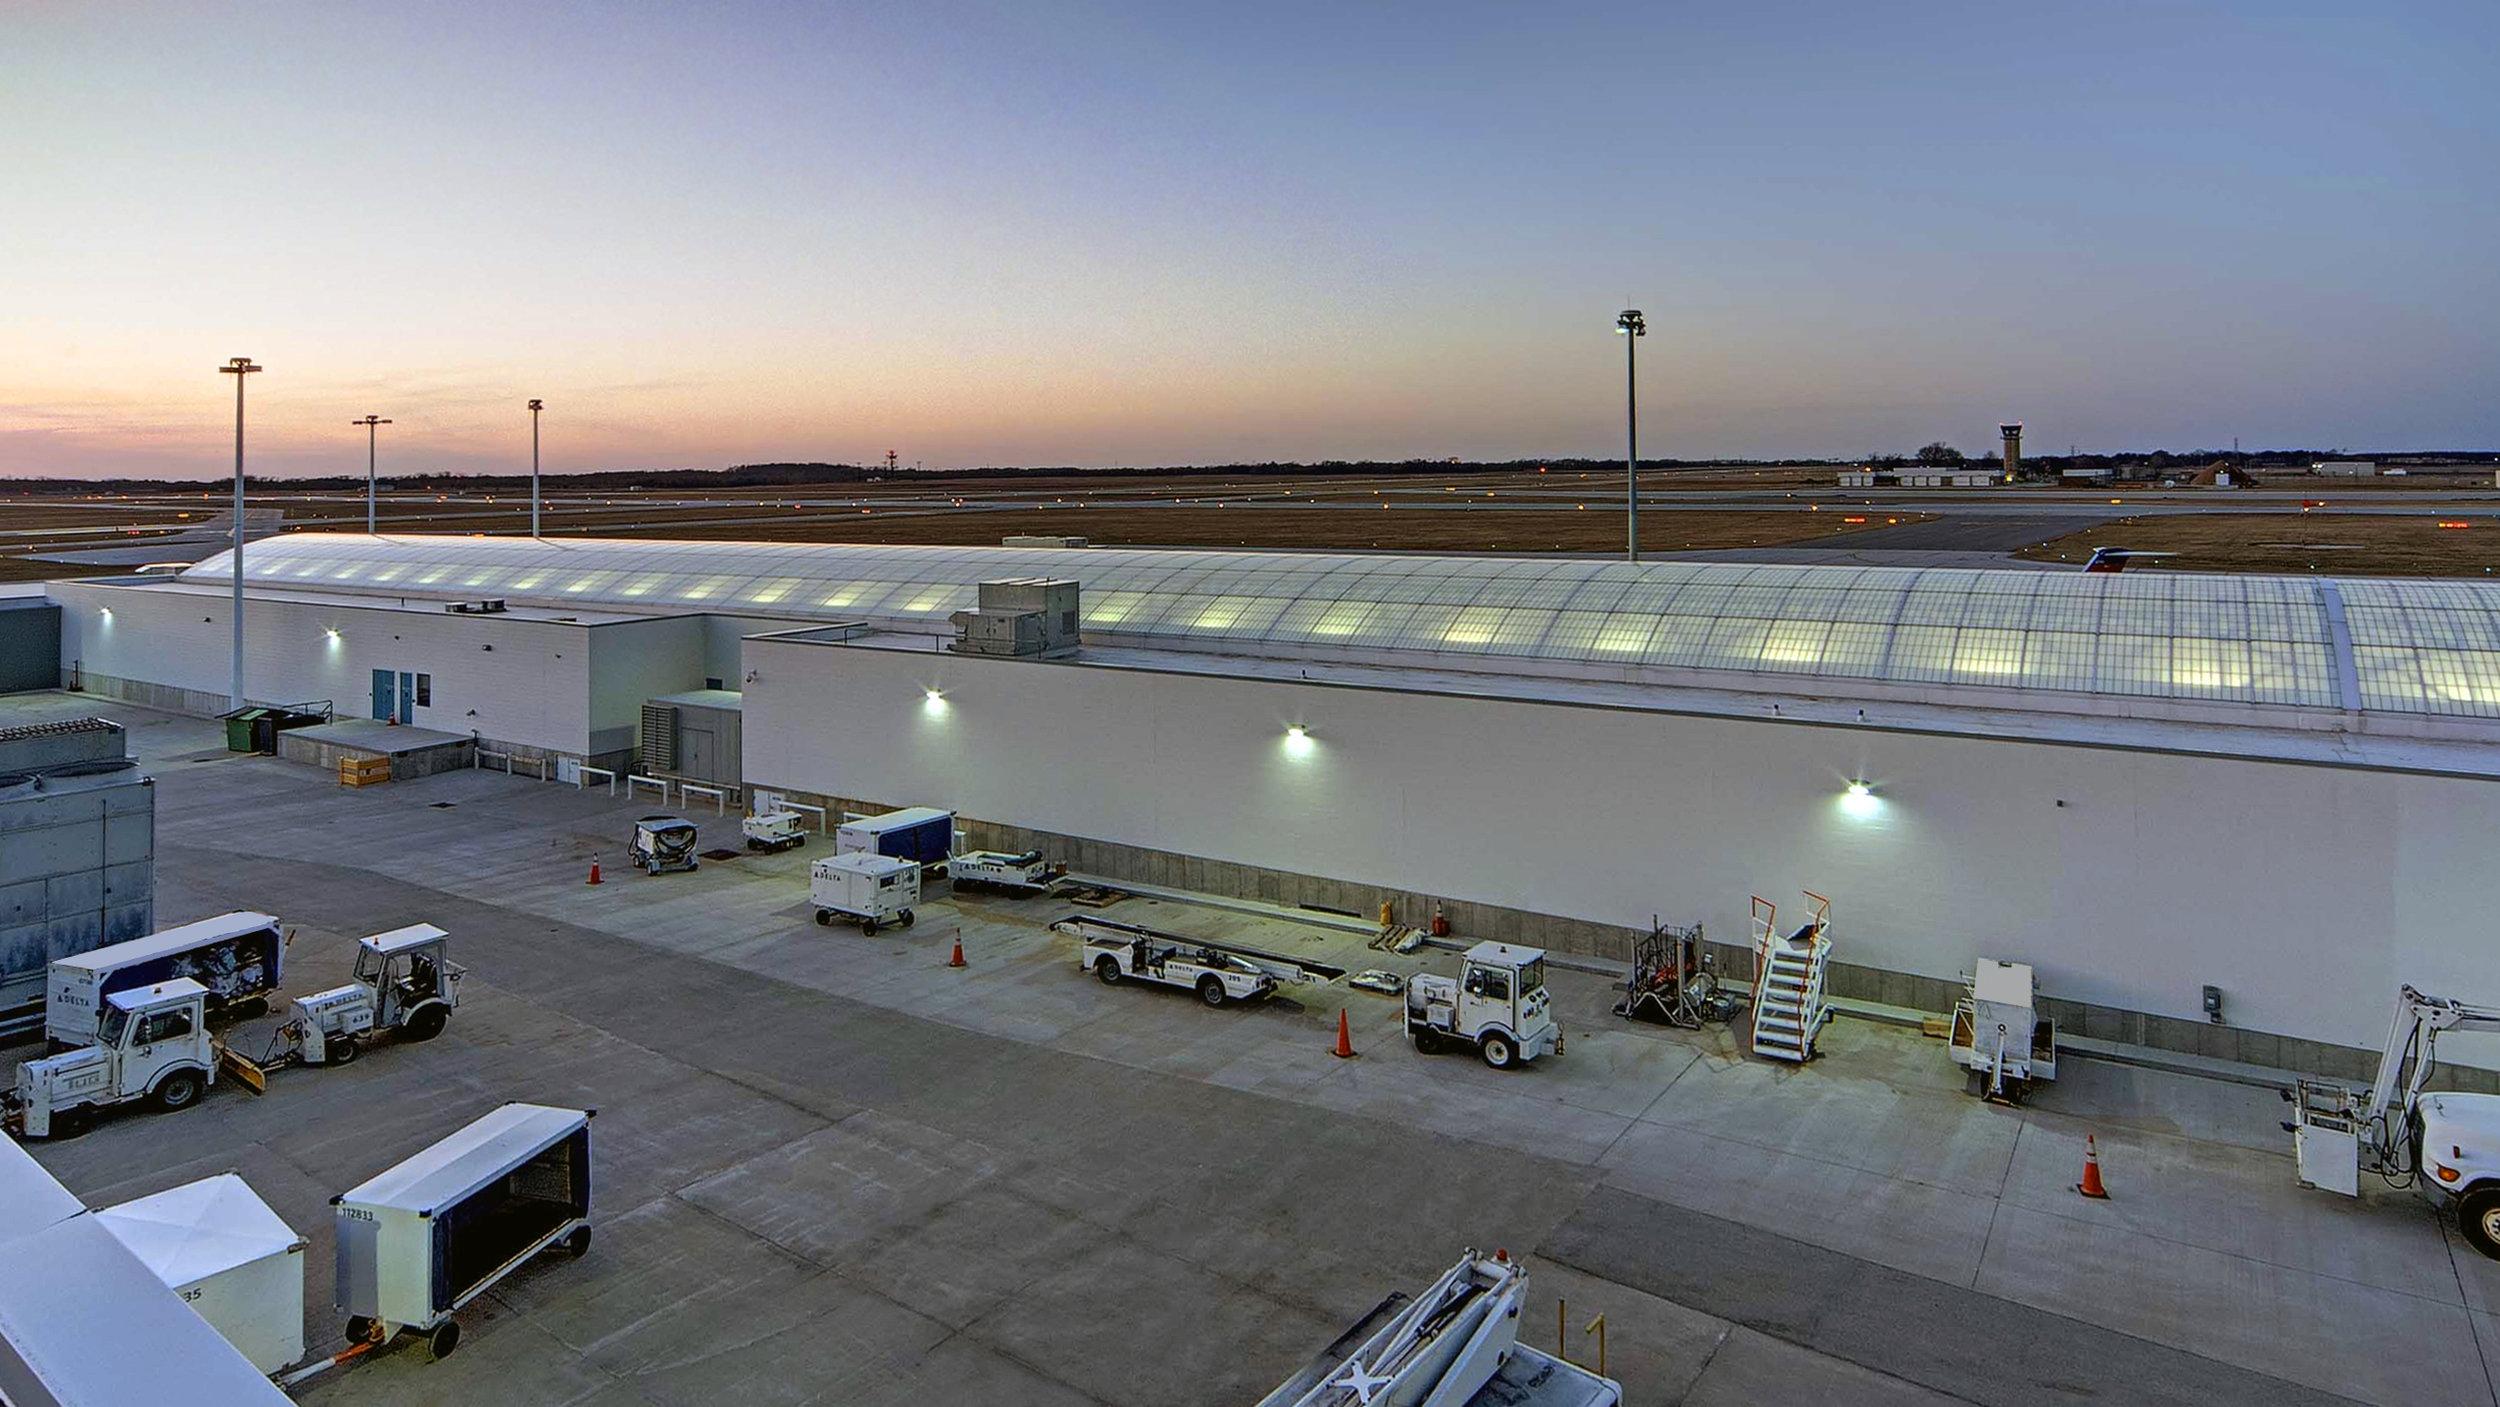 South Bend International Concourse Rear View.jpg